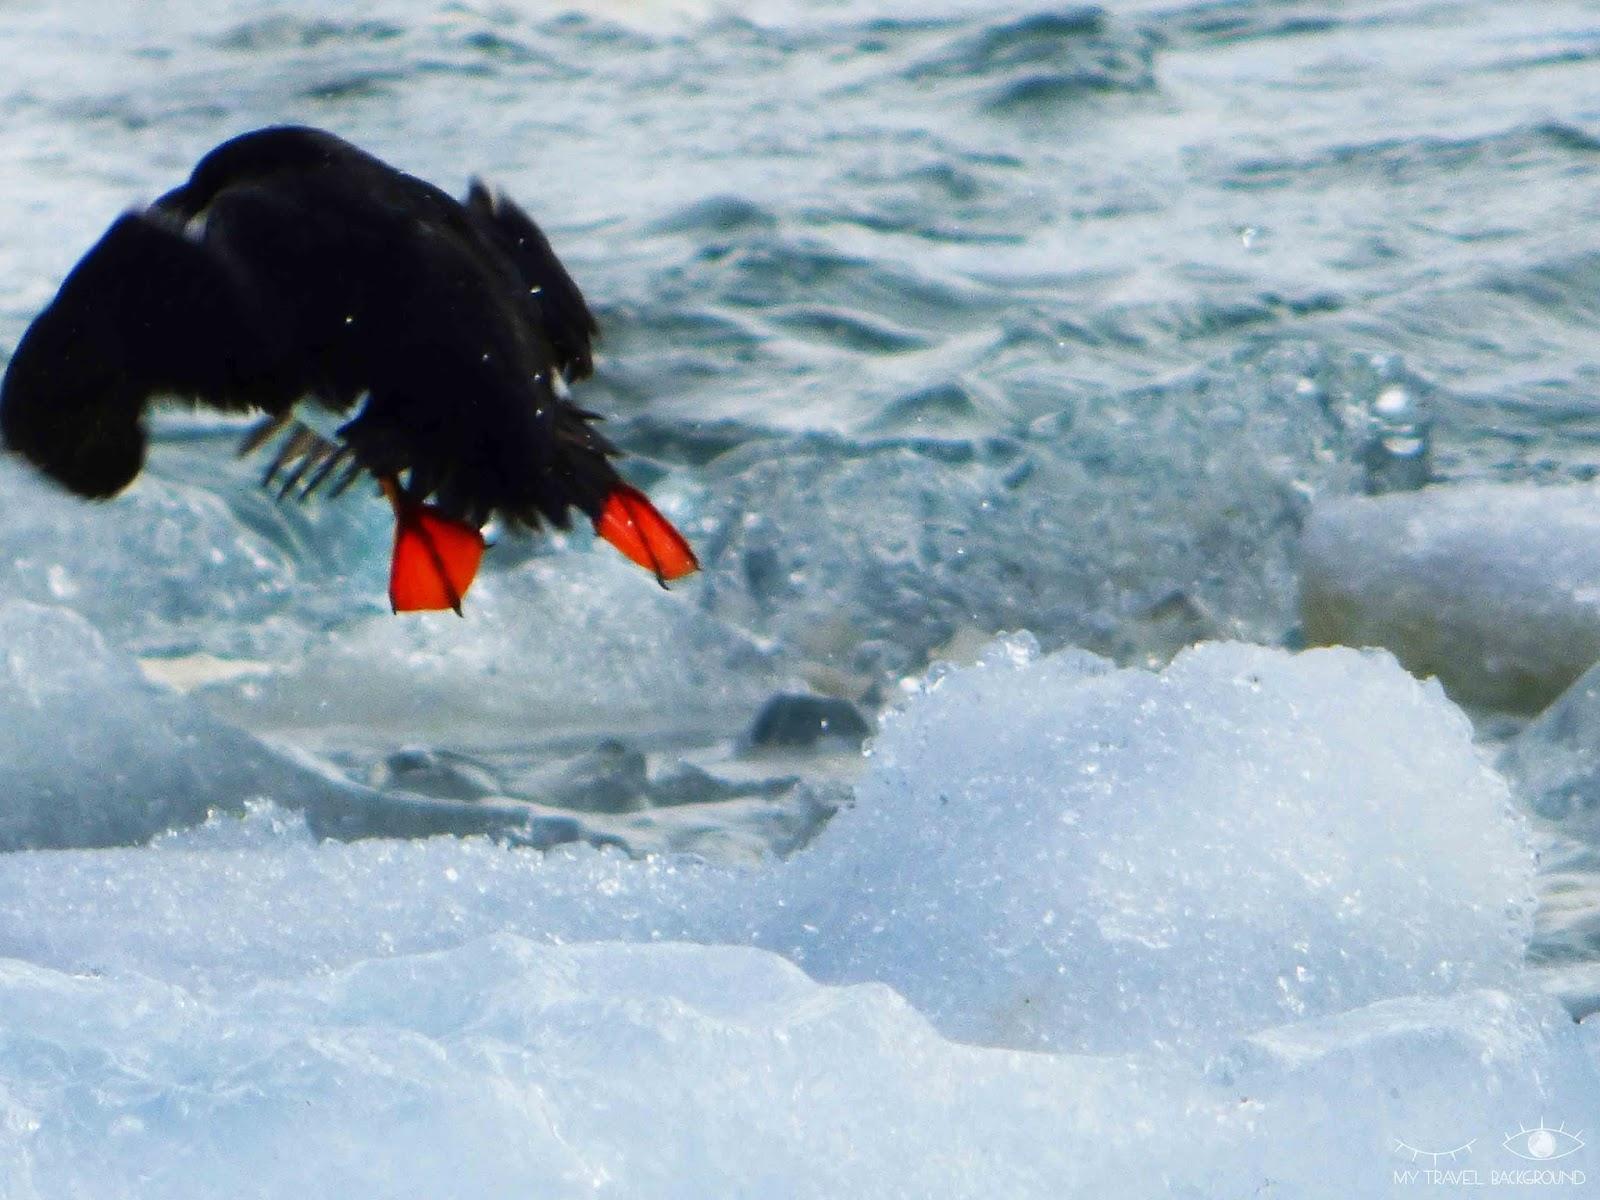 My Travel Background : 15 photos prises au bon moment ! Islande